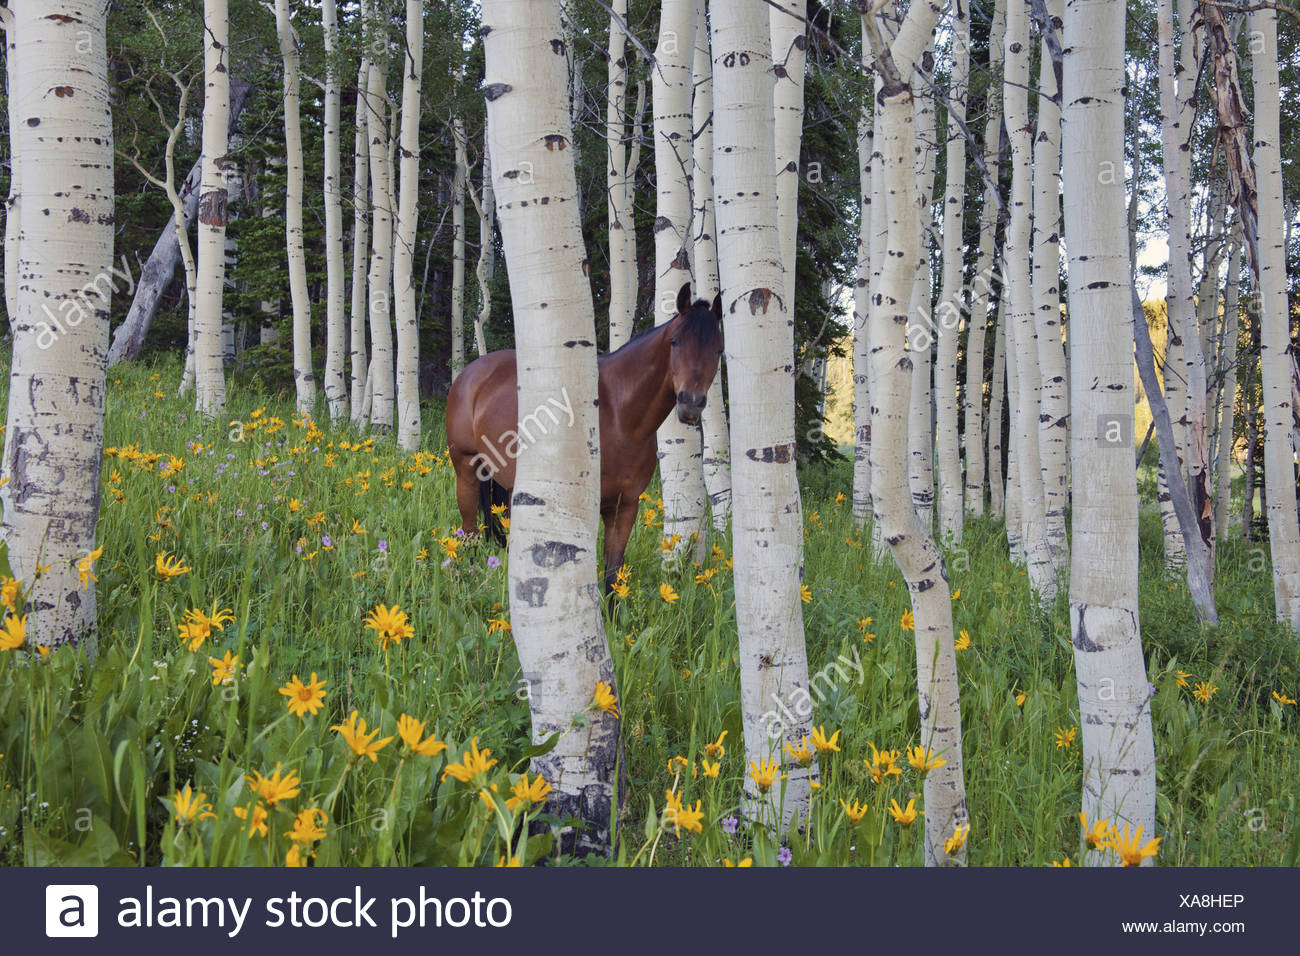 Caballo en un campo de flores silvestres y árboles de Aspen montañas Uinta Utah Imagen De Stock